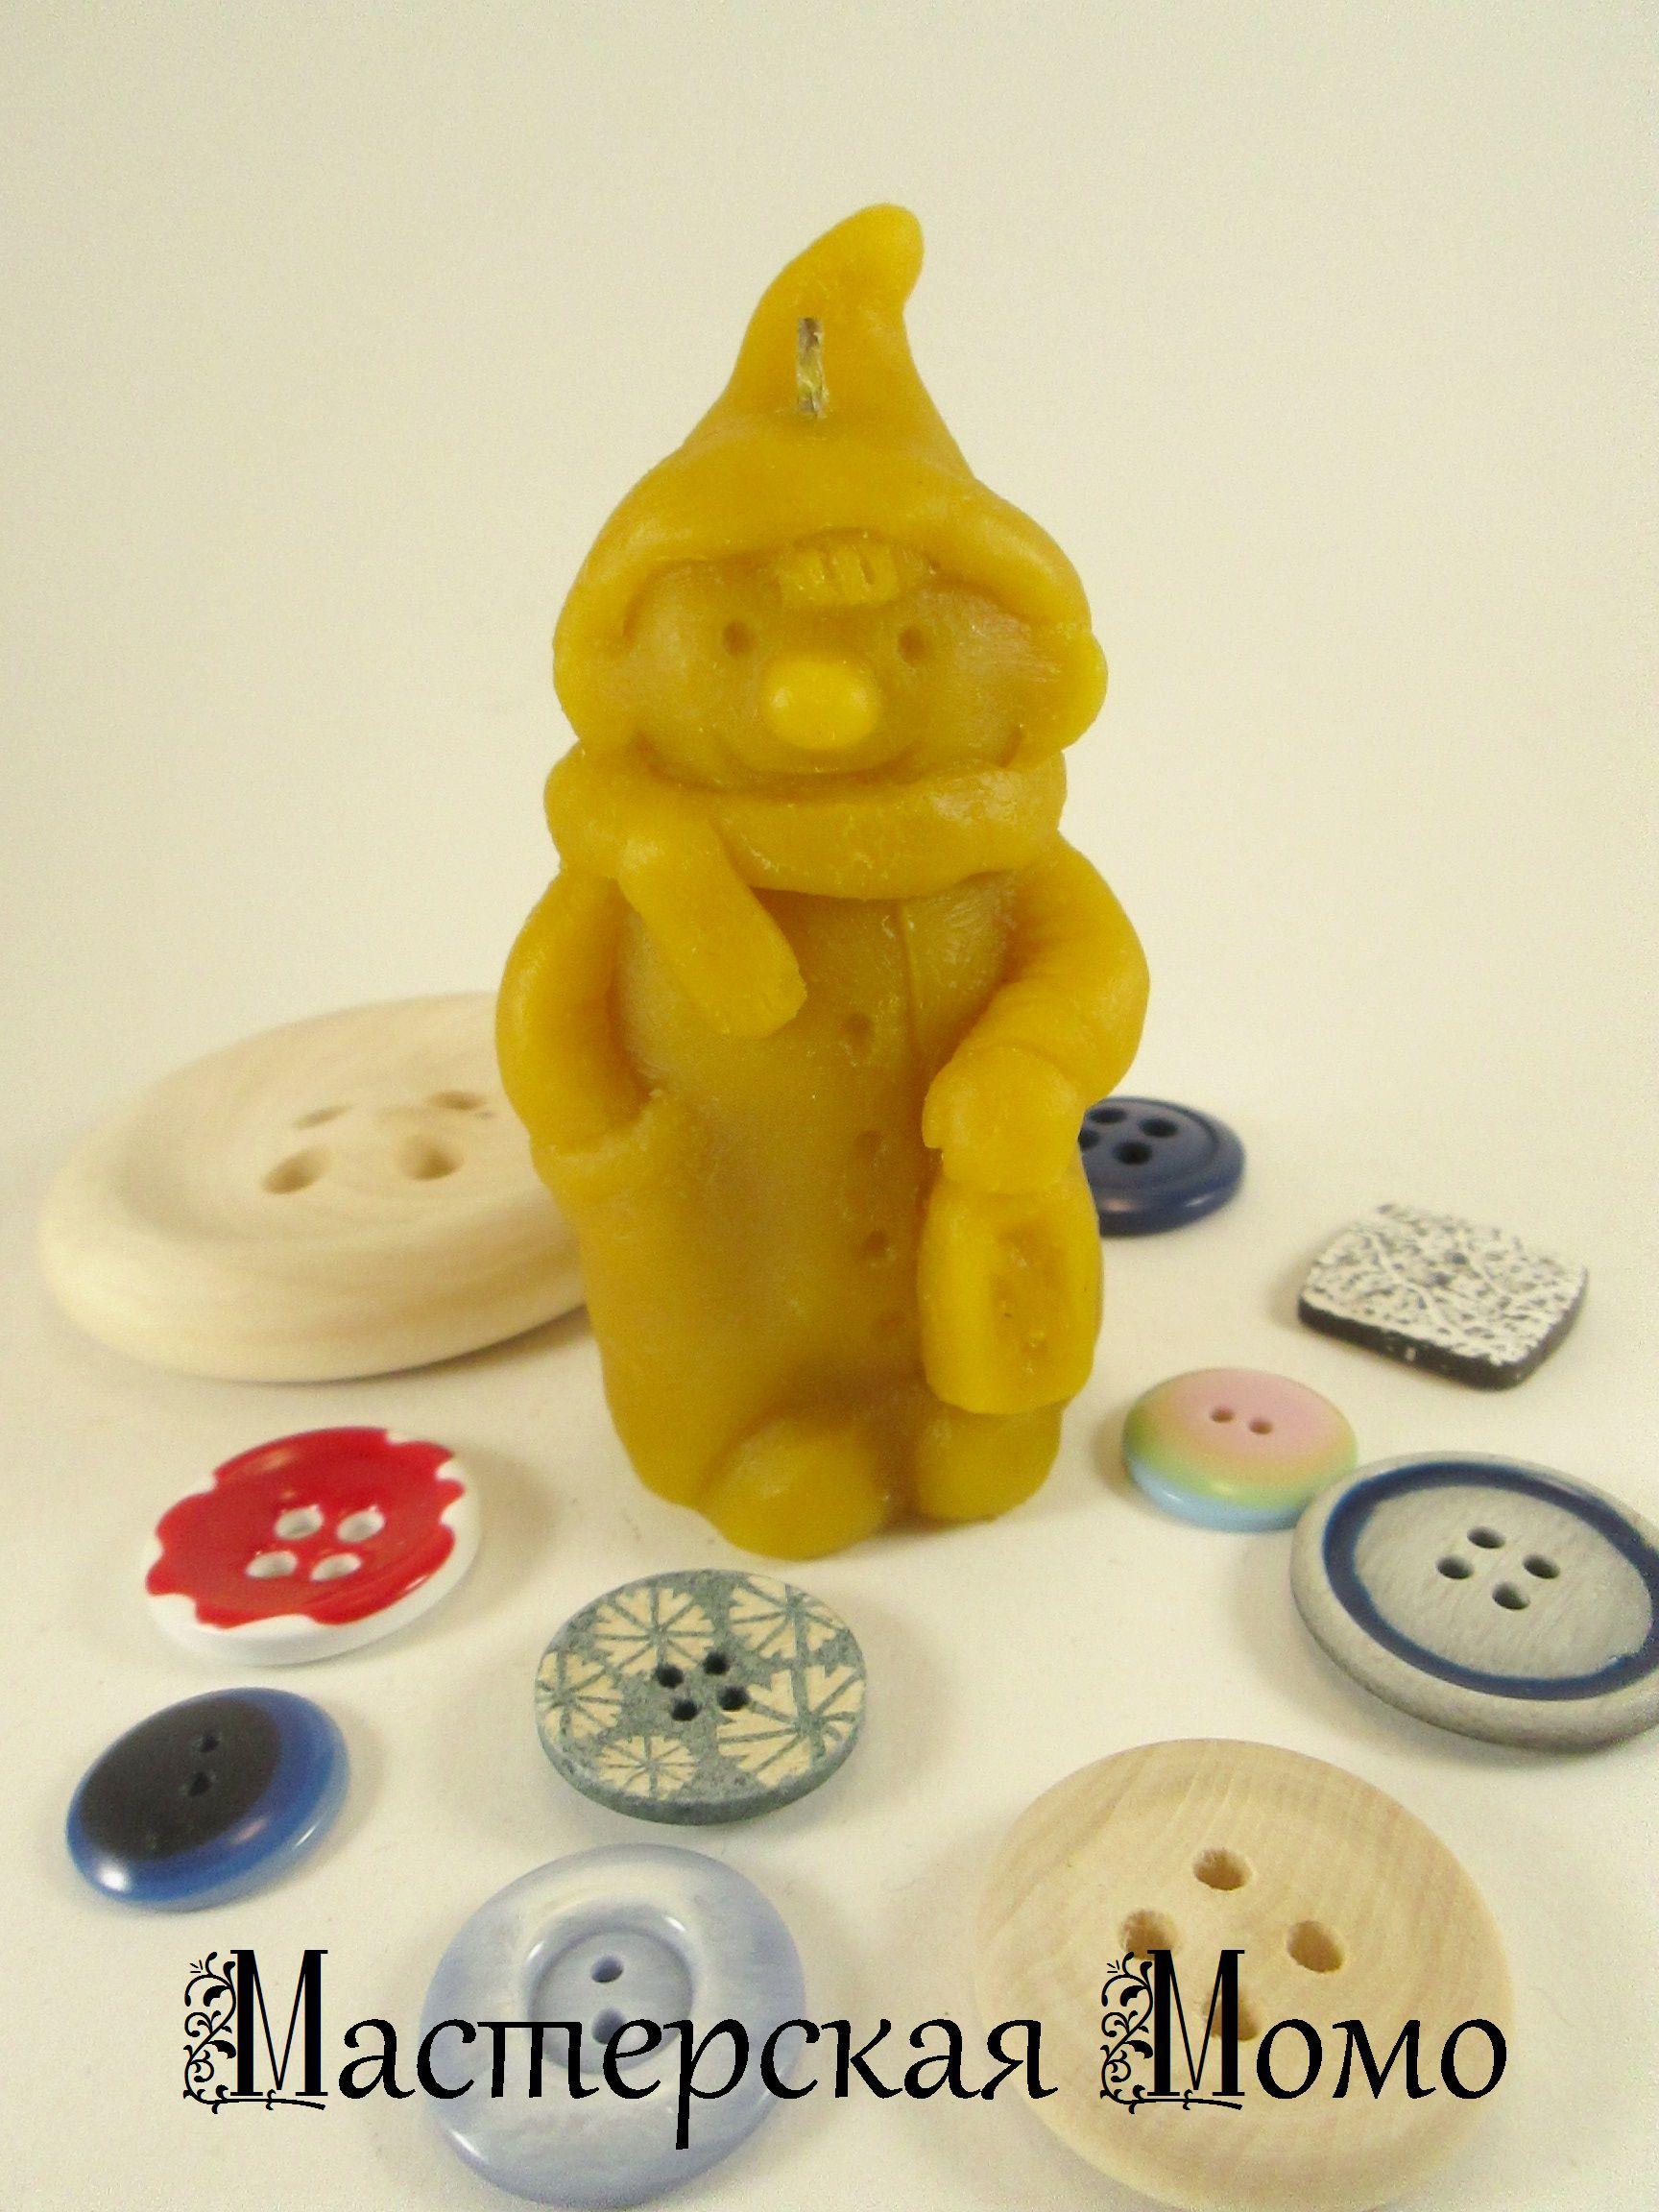 yellow interior light candle